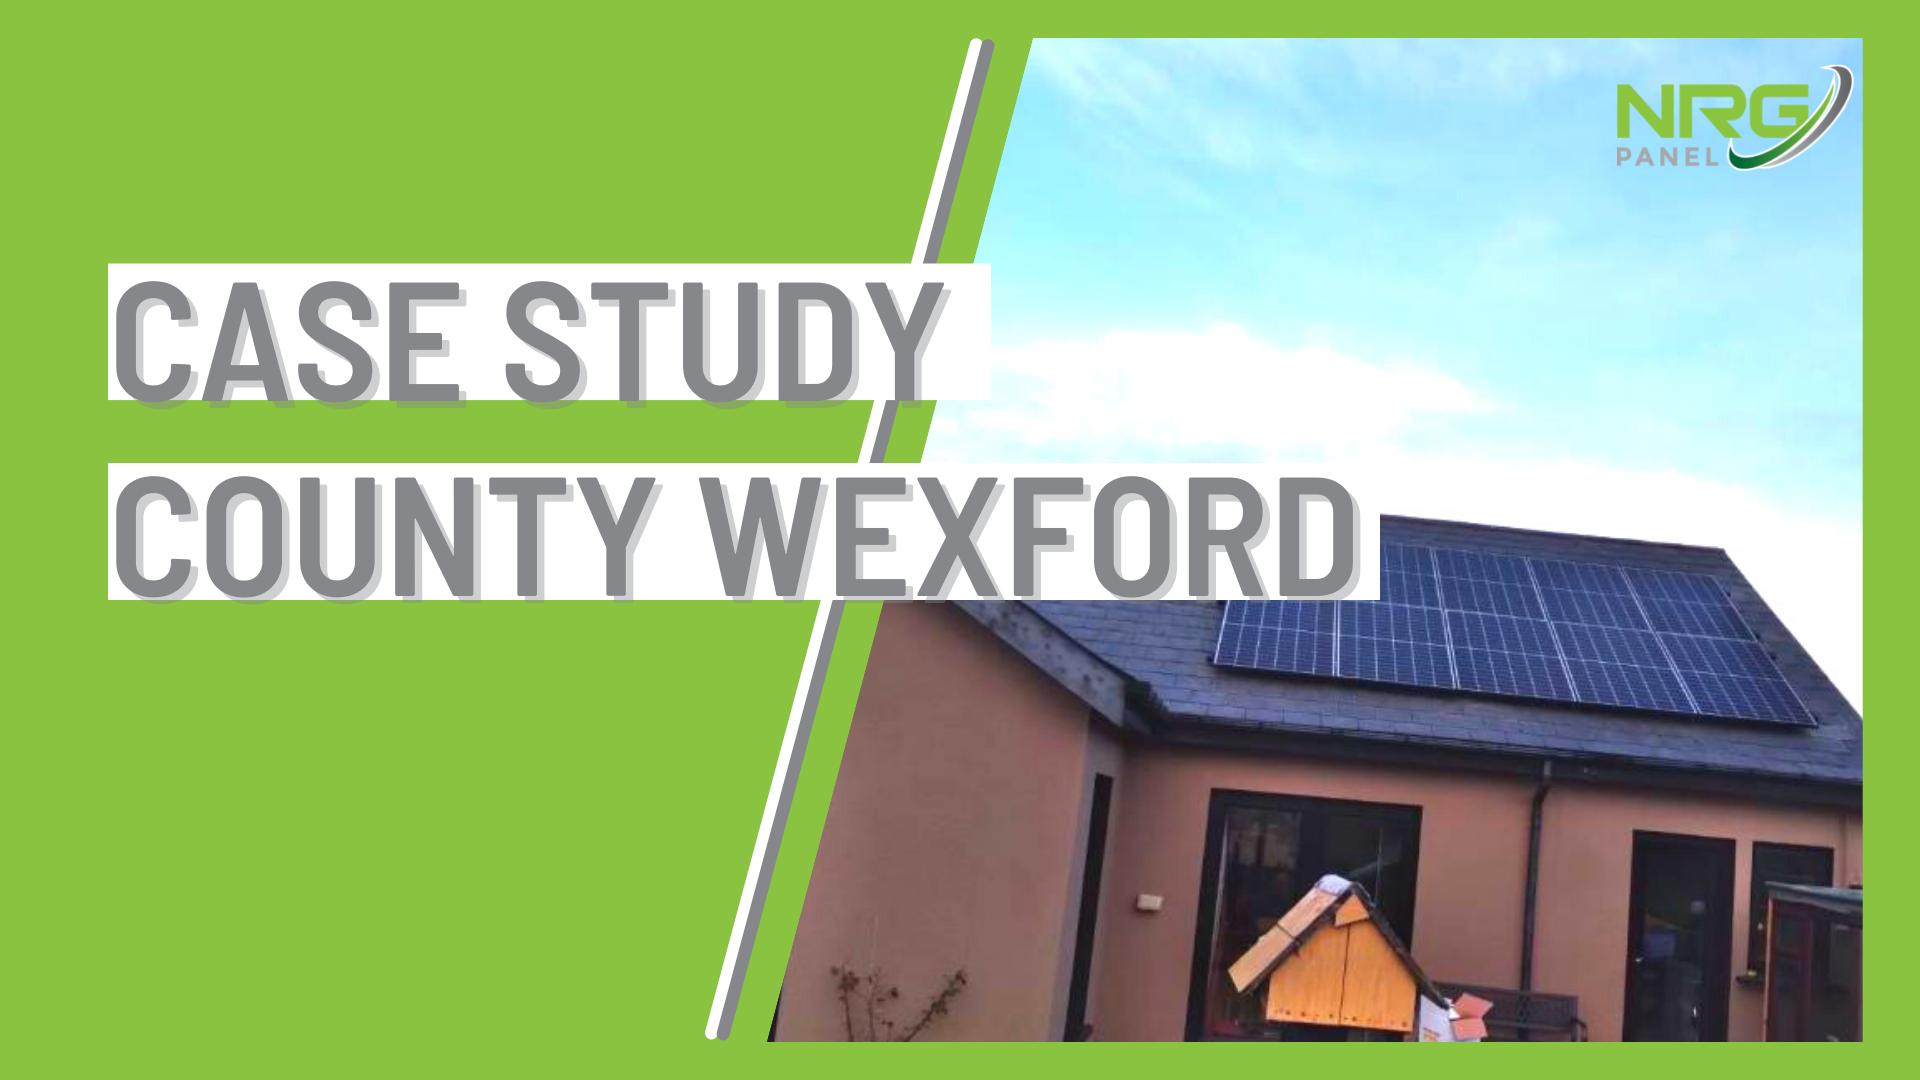 Case Study - Solar Panel Install Co. Wexford - NRG Panel - #1